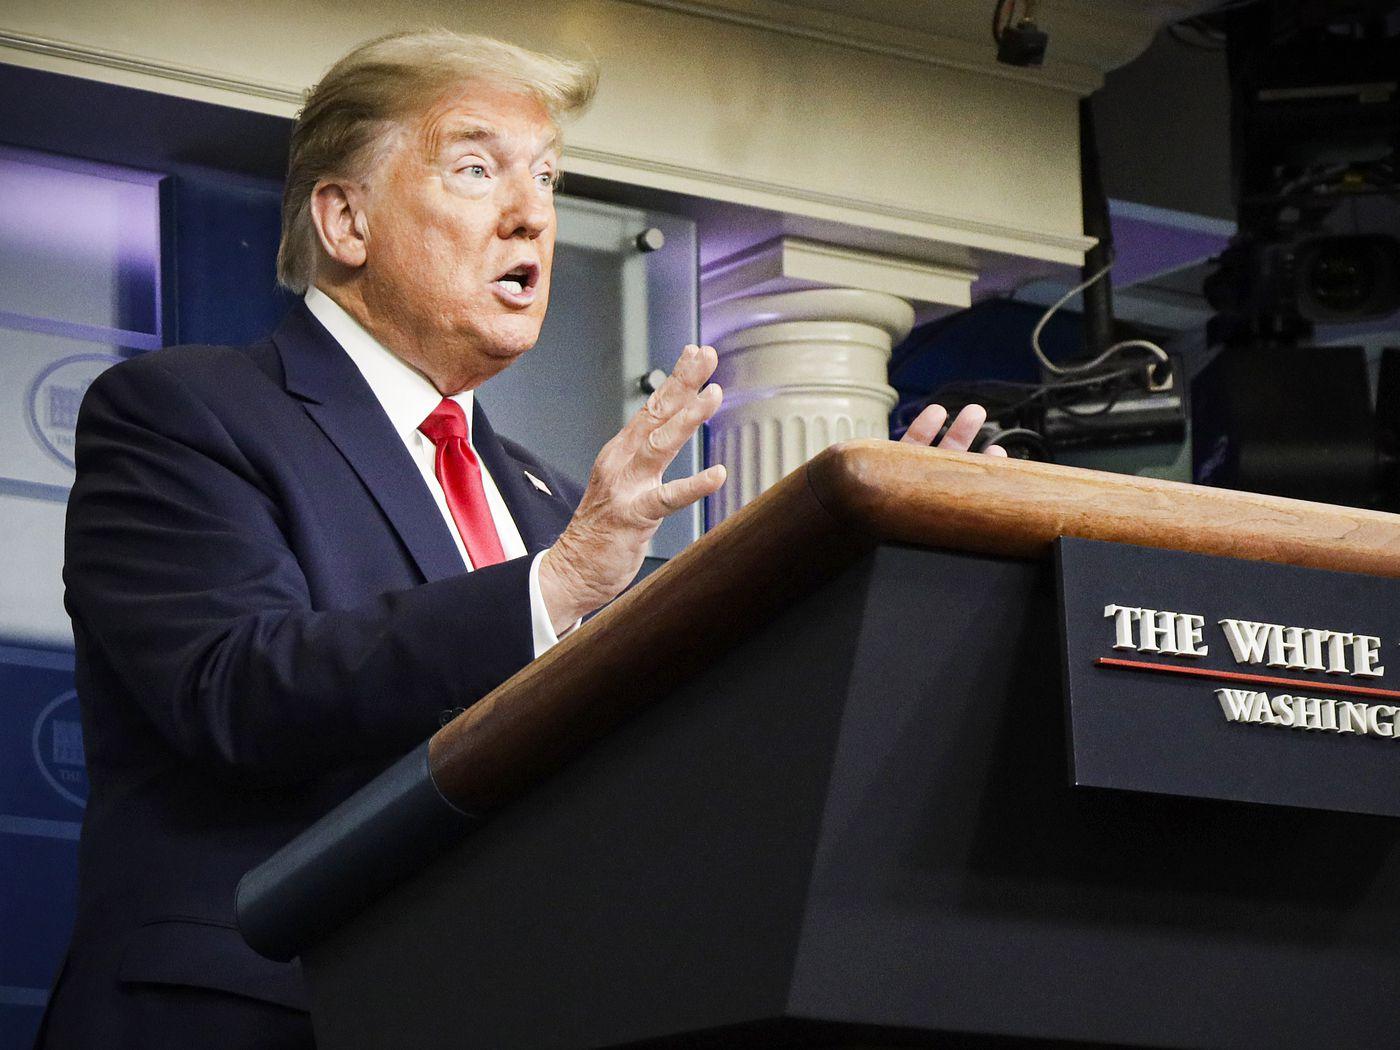 Trump S Latest Coronavirus Briefing Featured An Epic Meltdown Vox